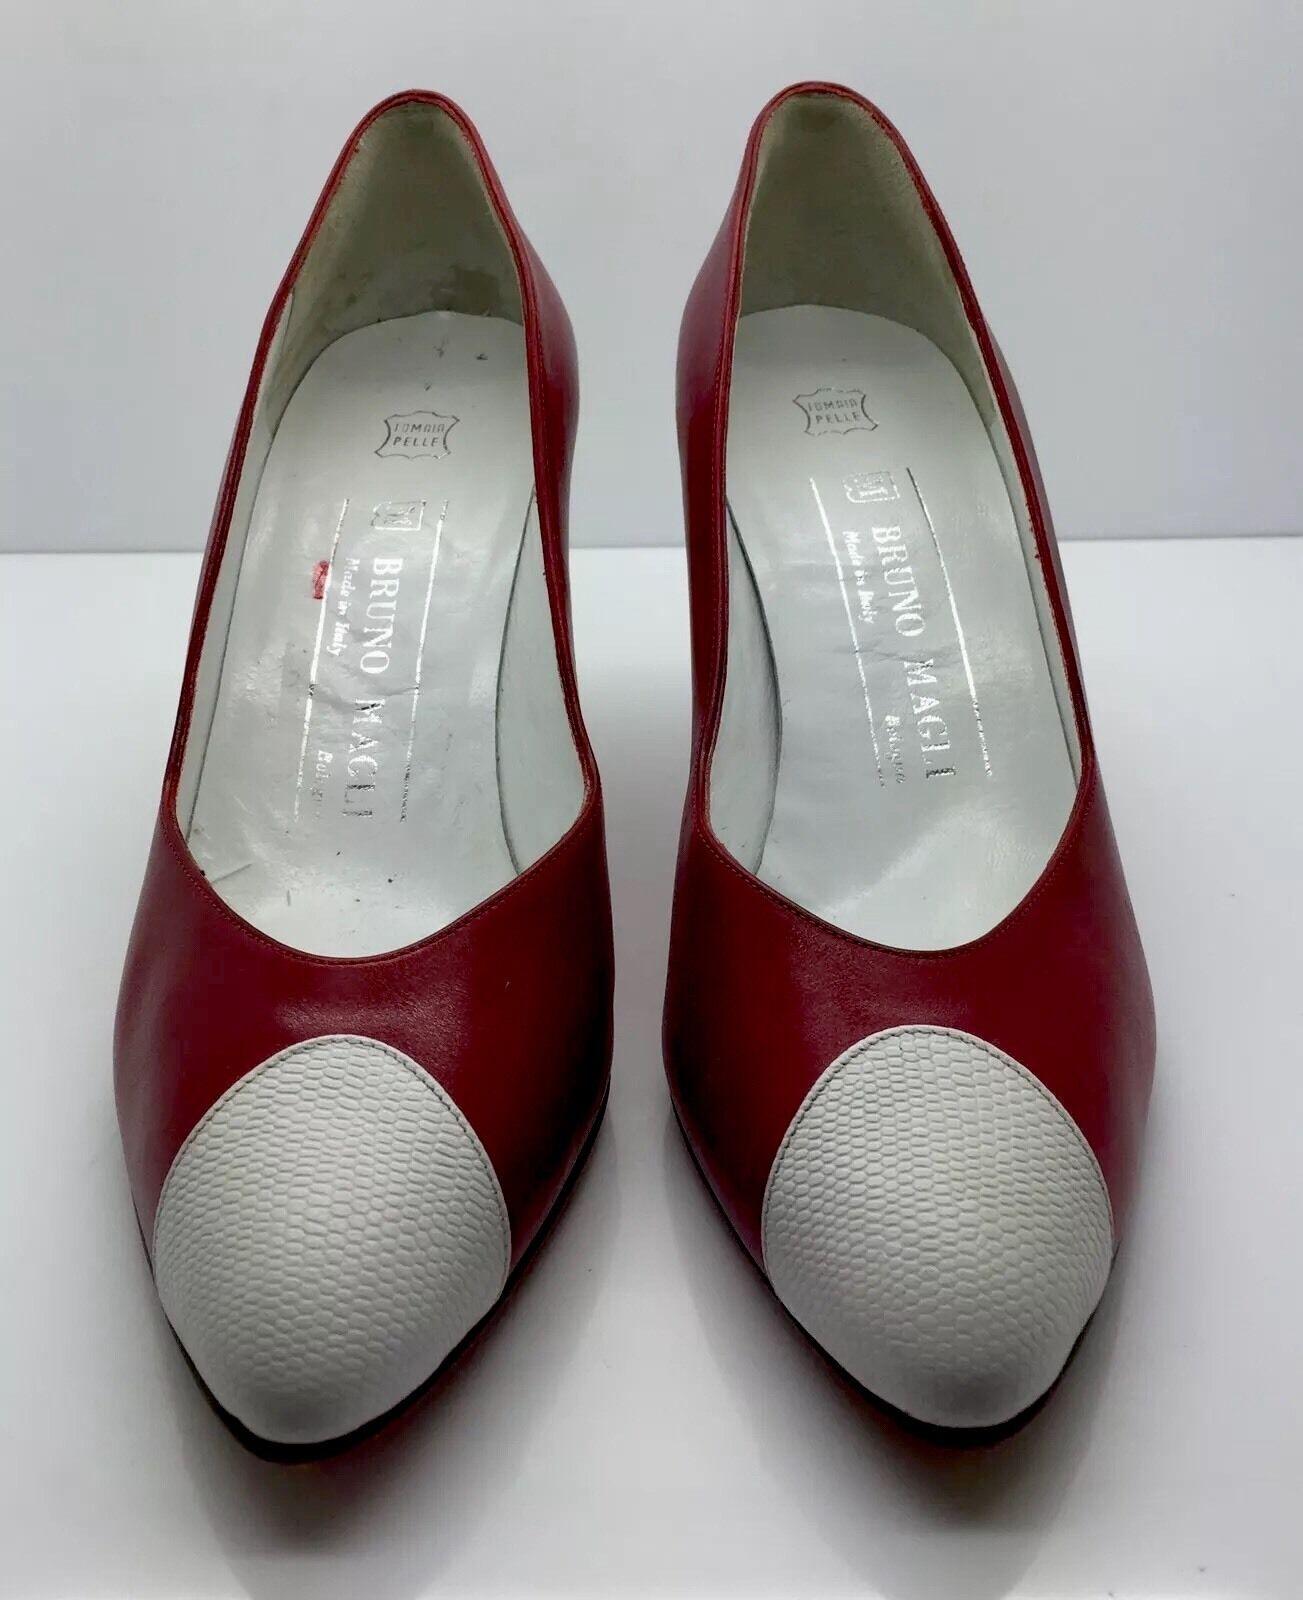 BRUNO MAGLI Red Leather White Patent Cap Toe Classic Spectator Pumps 6.5 Italy